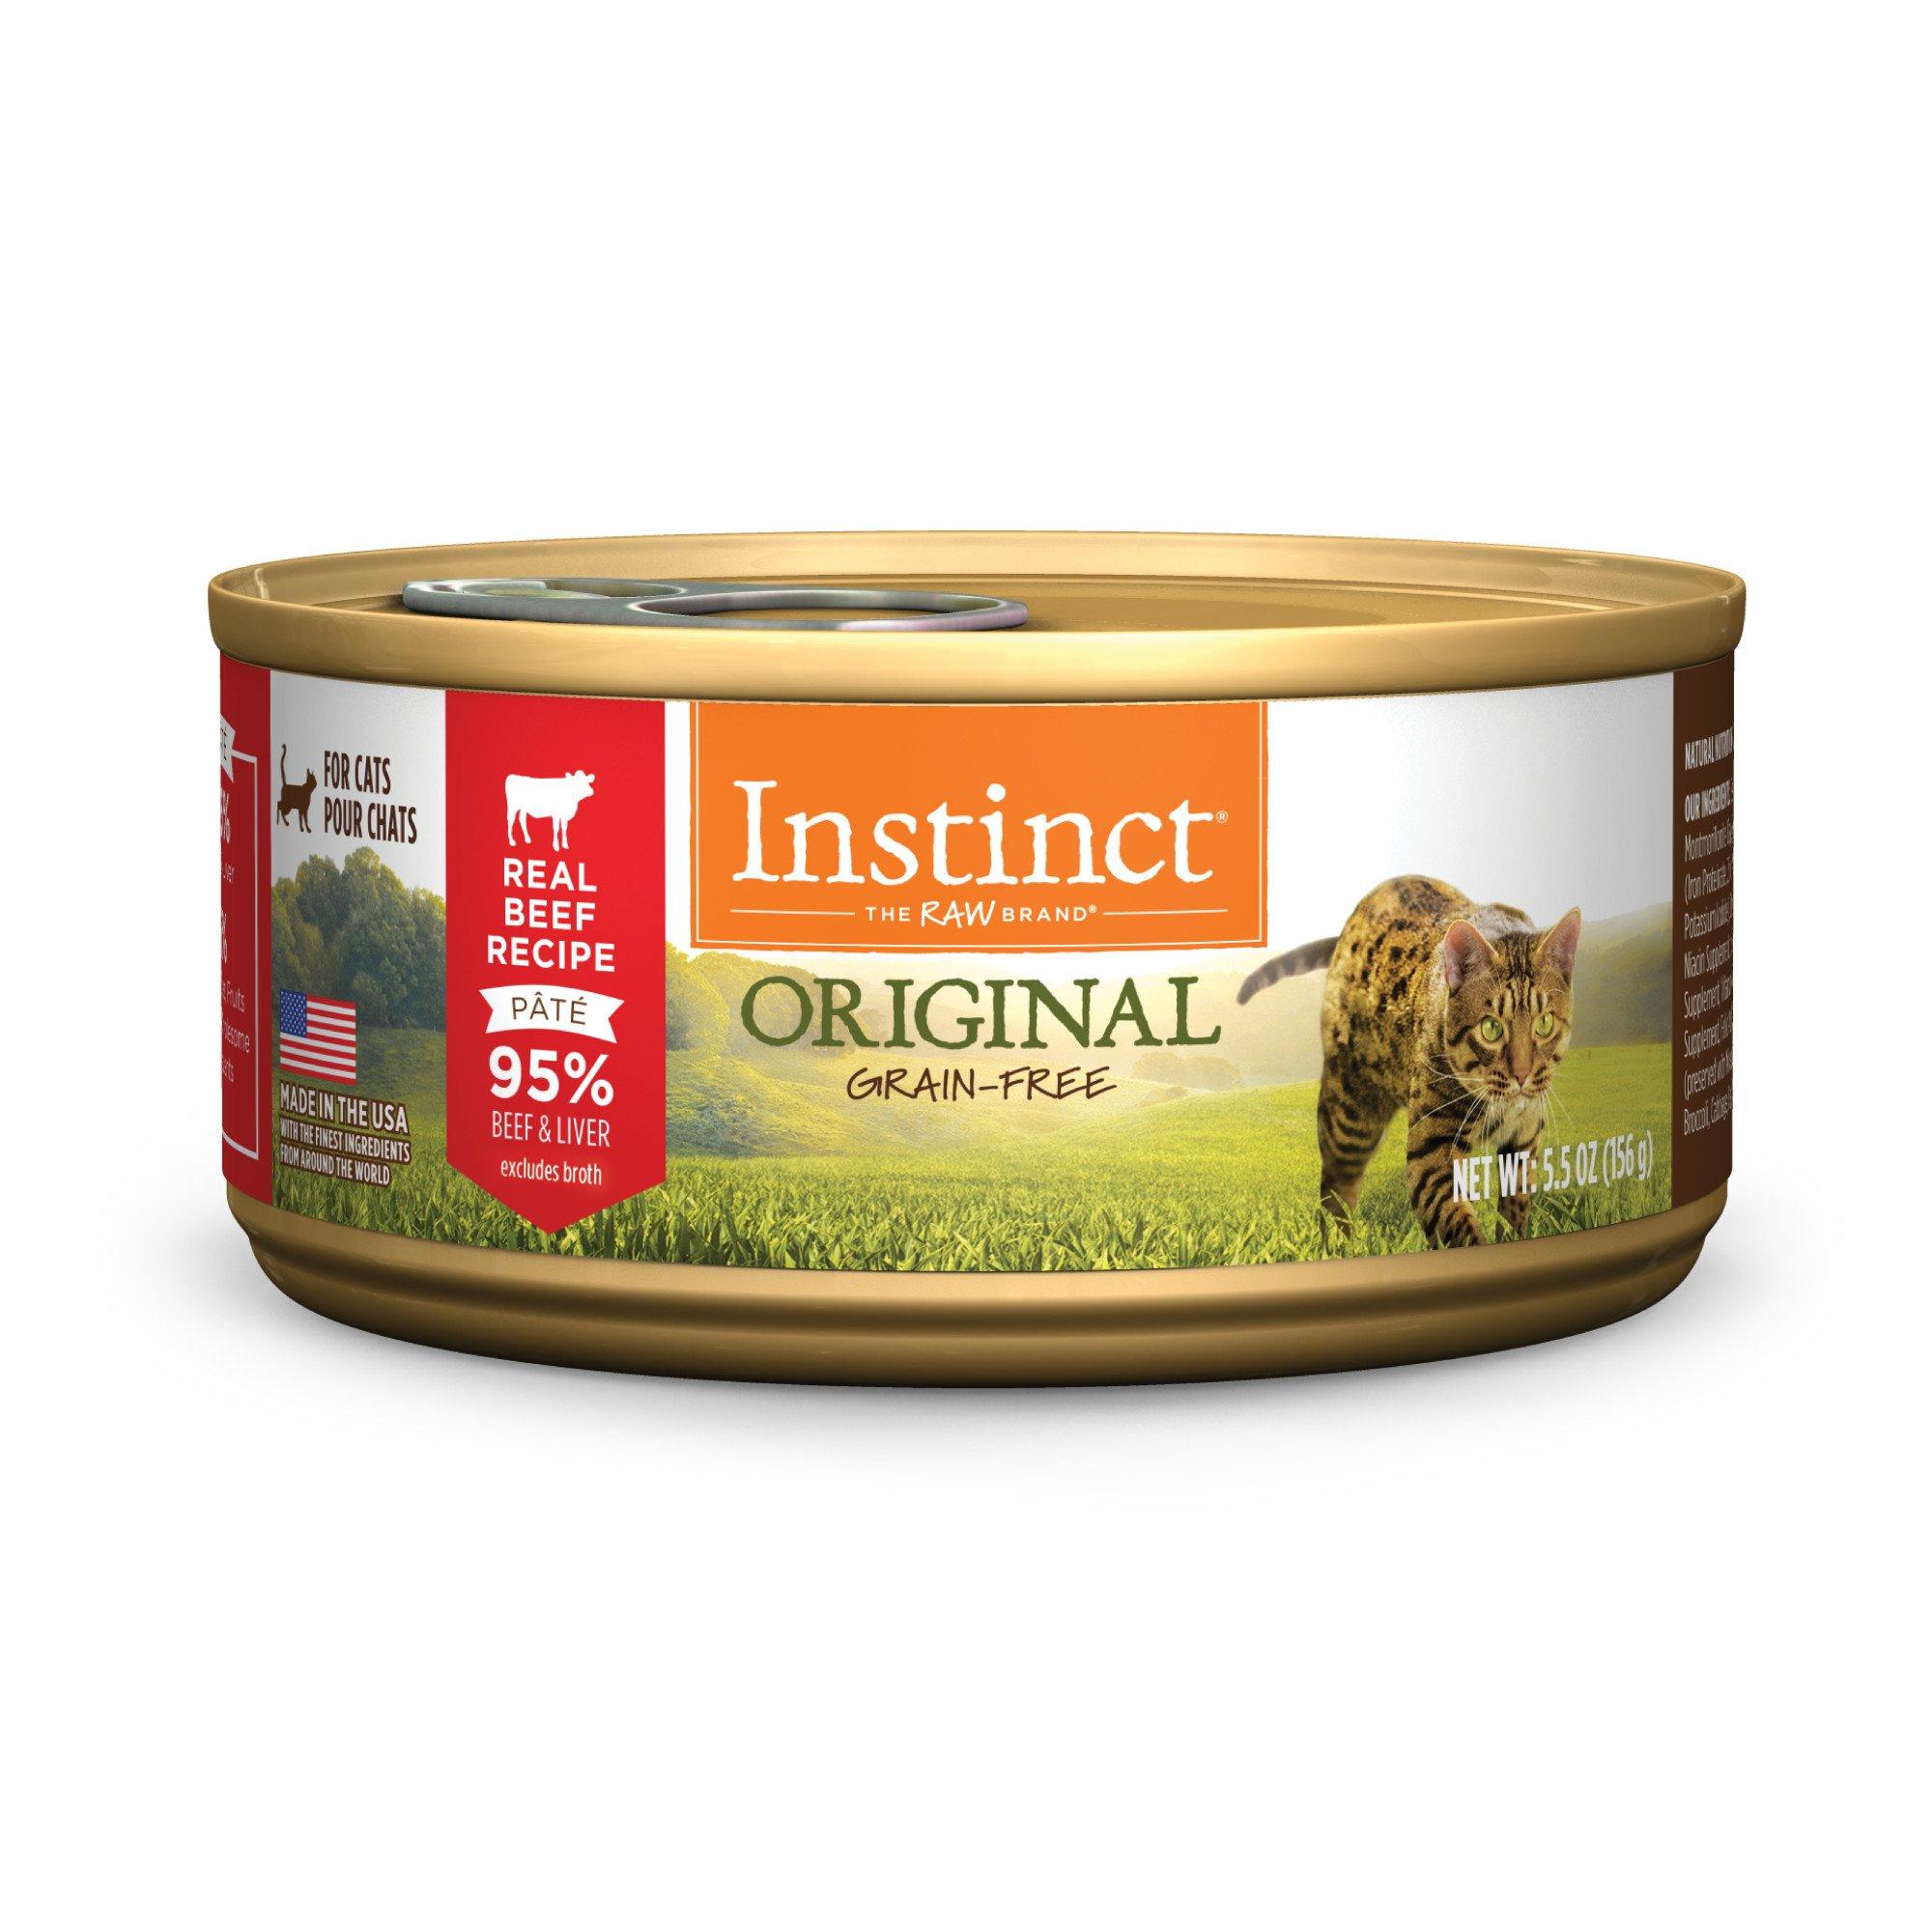 Instinct Canned Cat Food